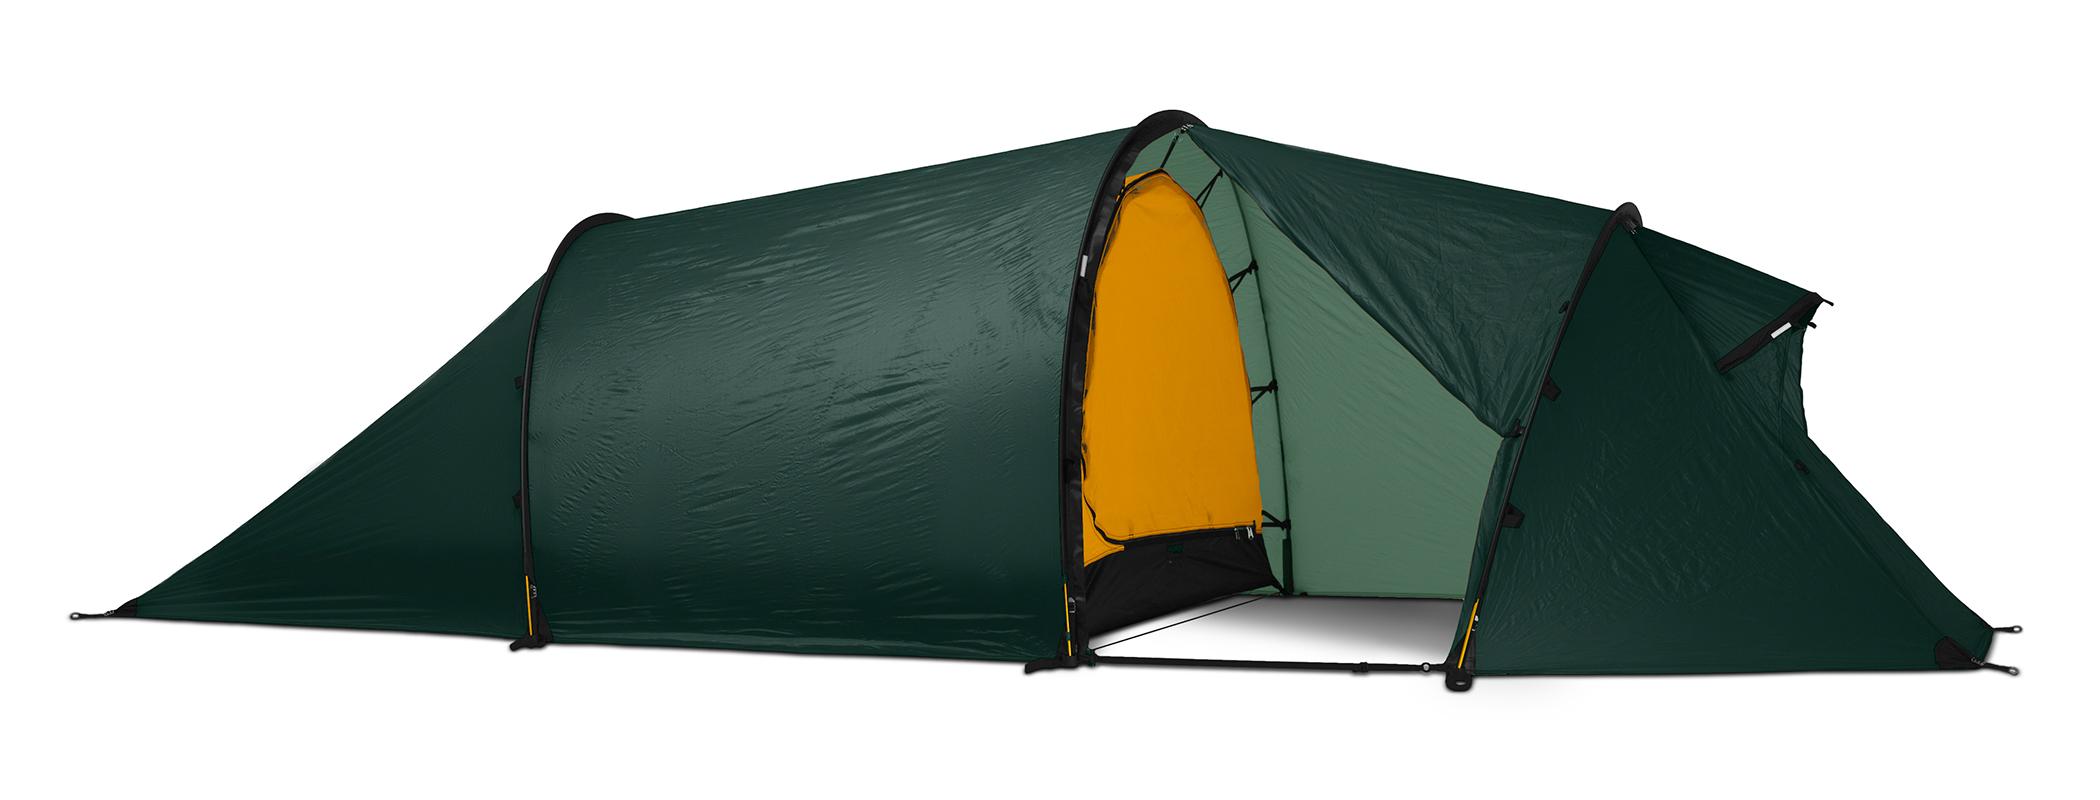 photo: Hilleberg Nallo 4 GT four-season tent